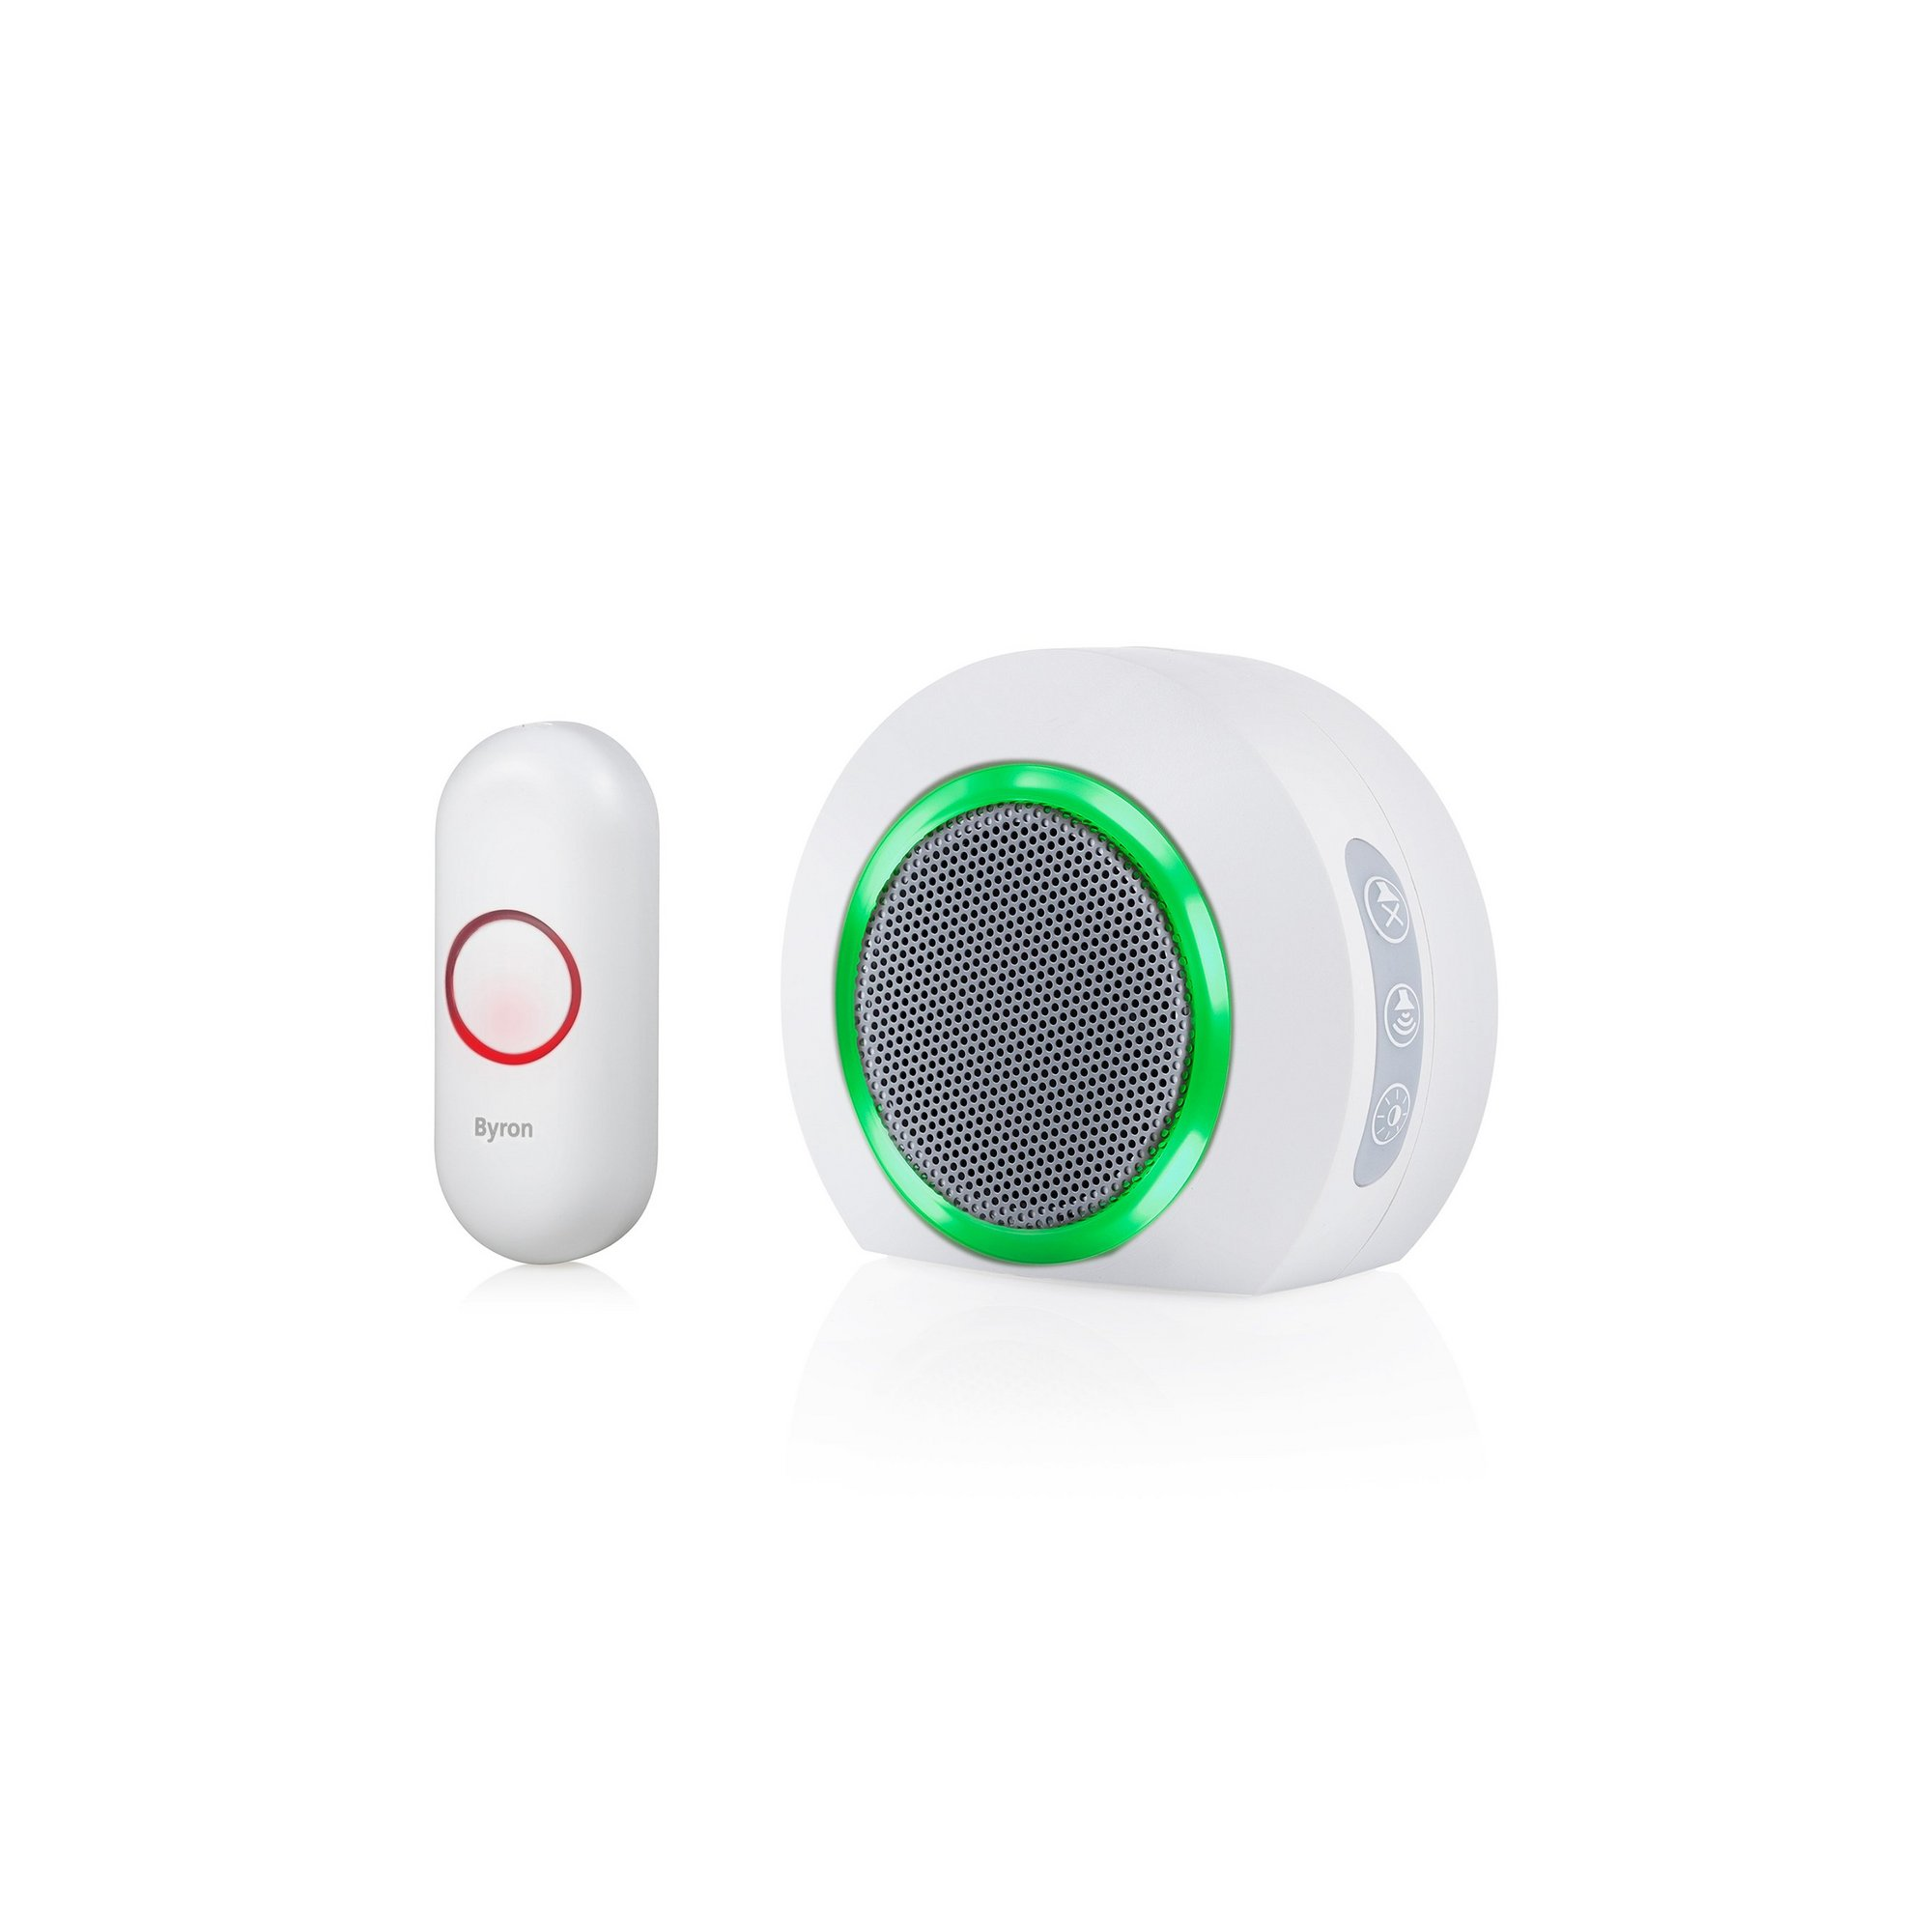 Image of Byron Wireless Plug-In Doorbell Set